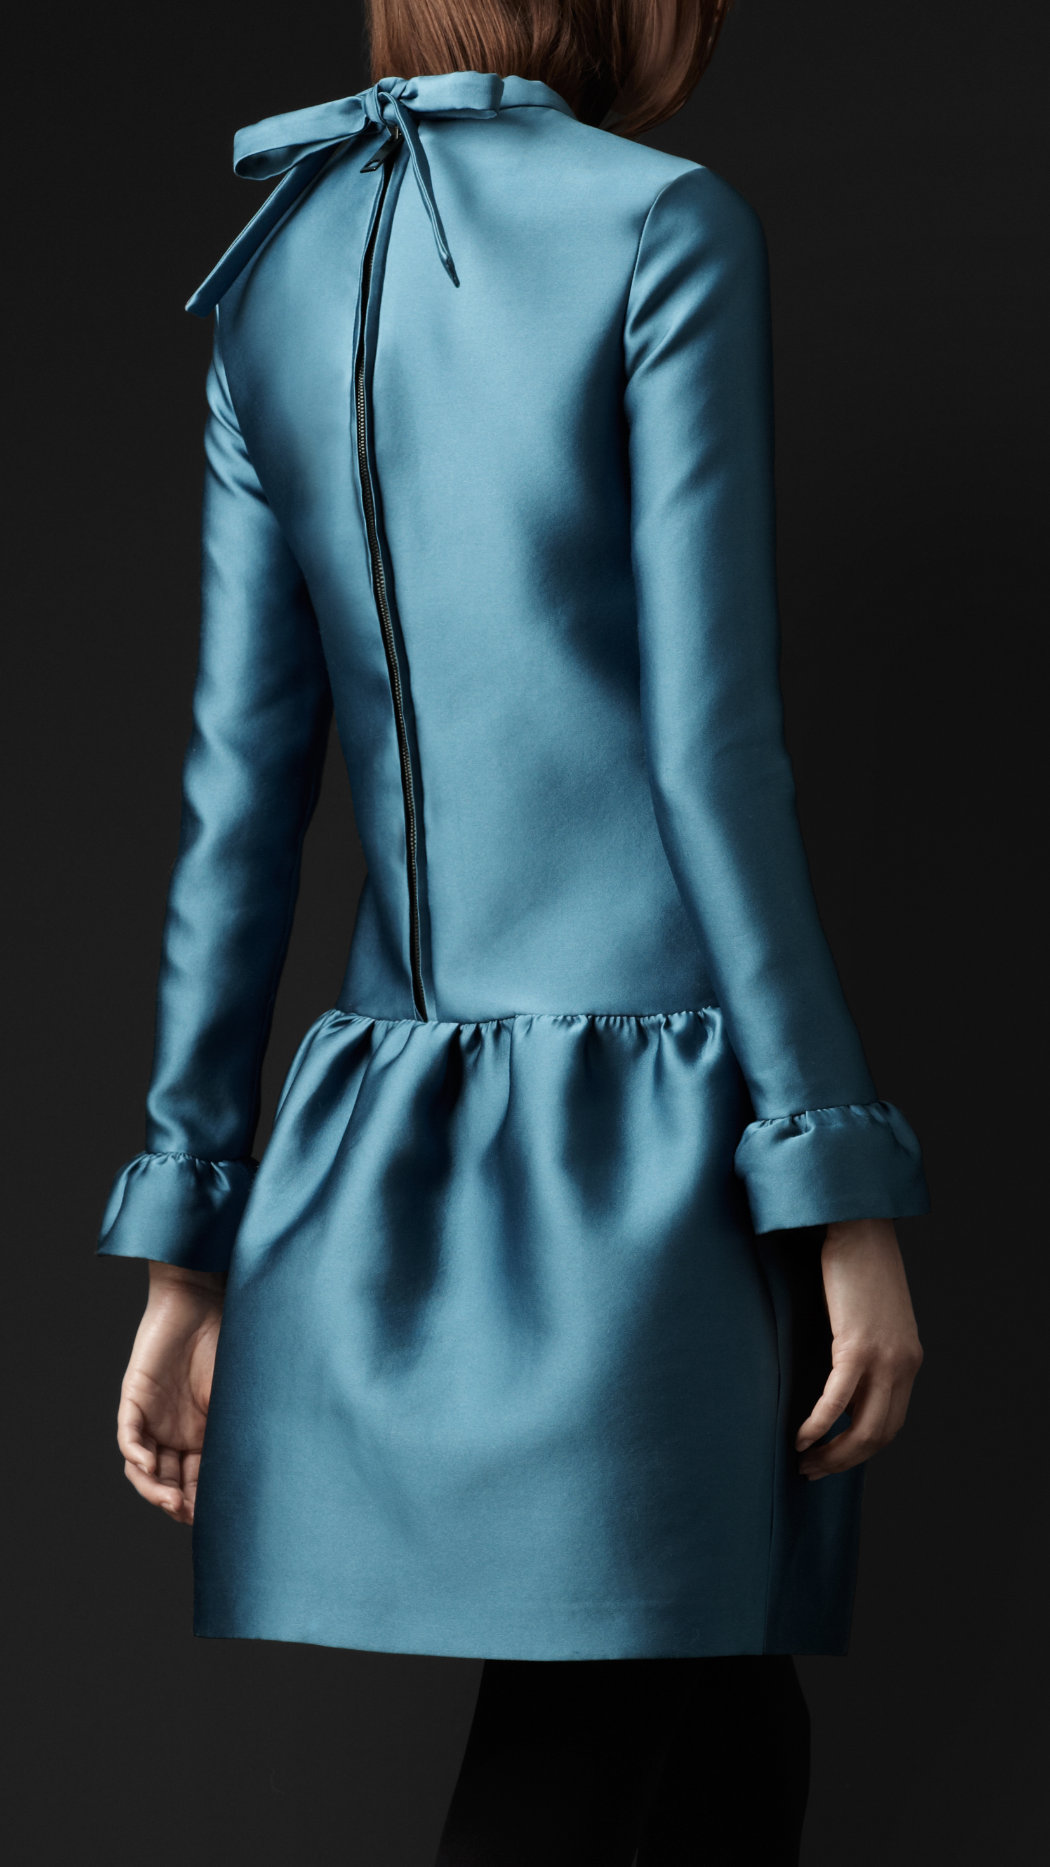 burberry-prorsum-long-sleeve-duchesse-silk-tunic-dress-2